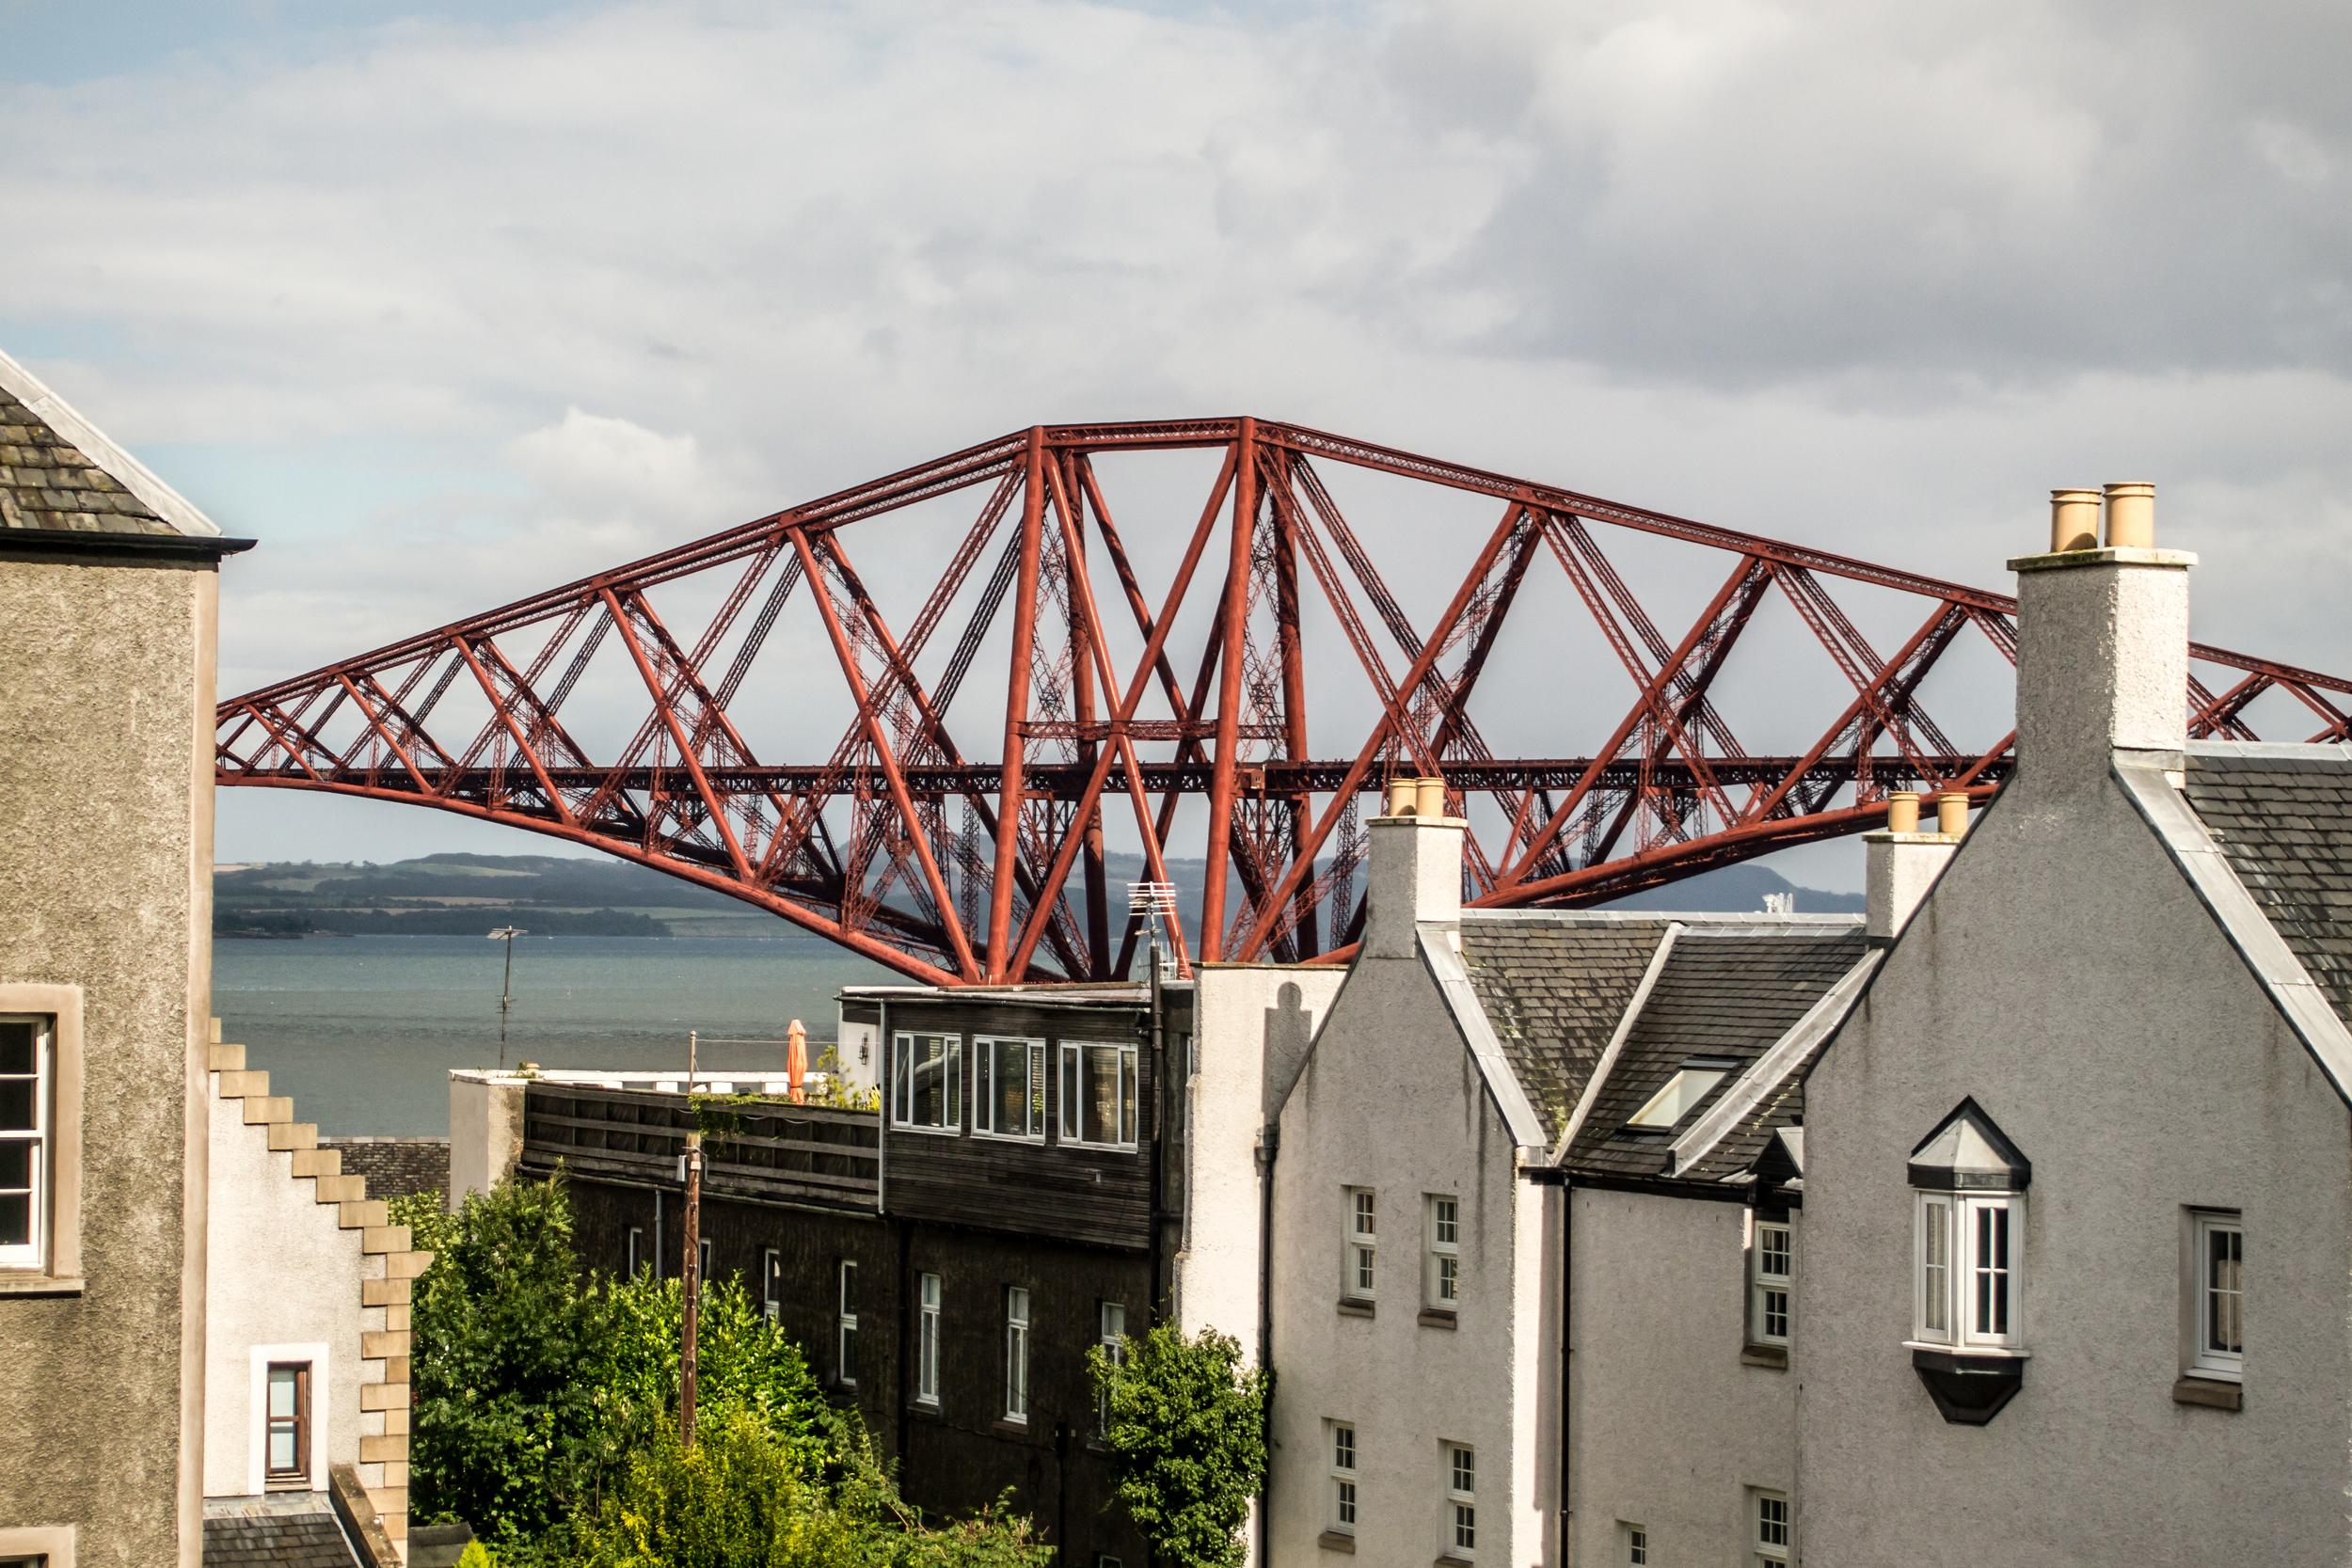 Scotland2015-225.jpg